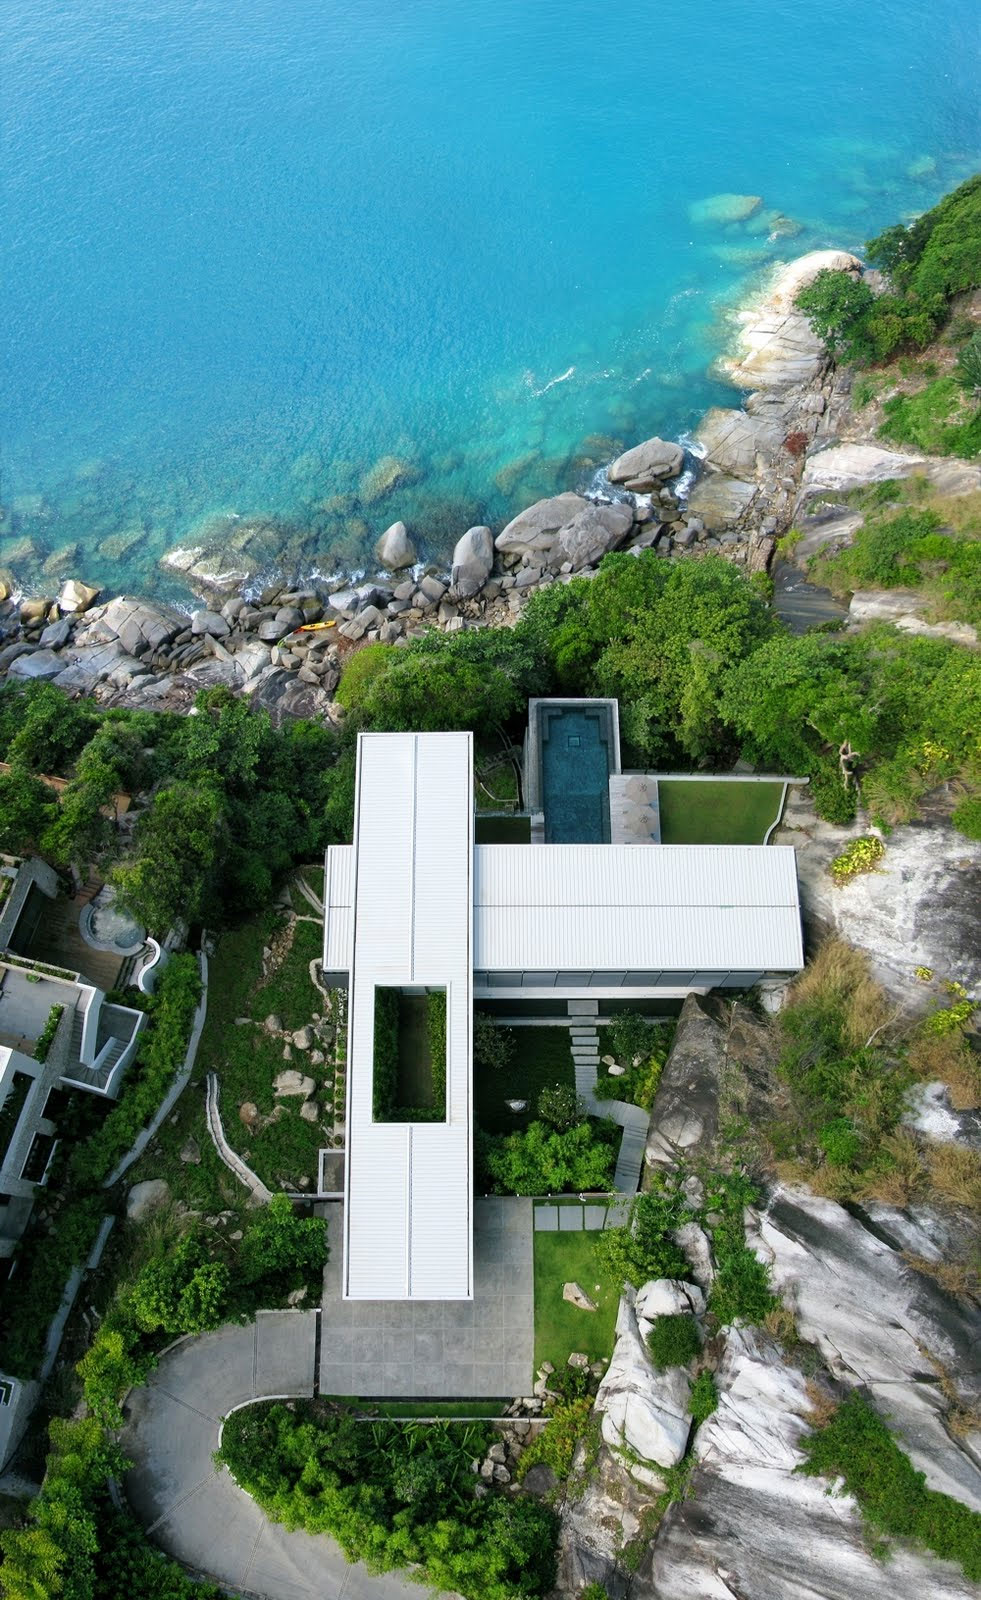 View from the Air, Villa Amanzi, Phuket,Thailand